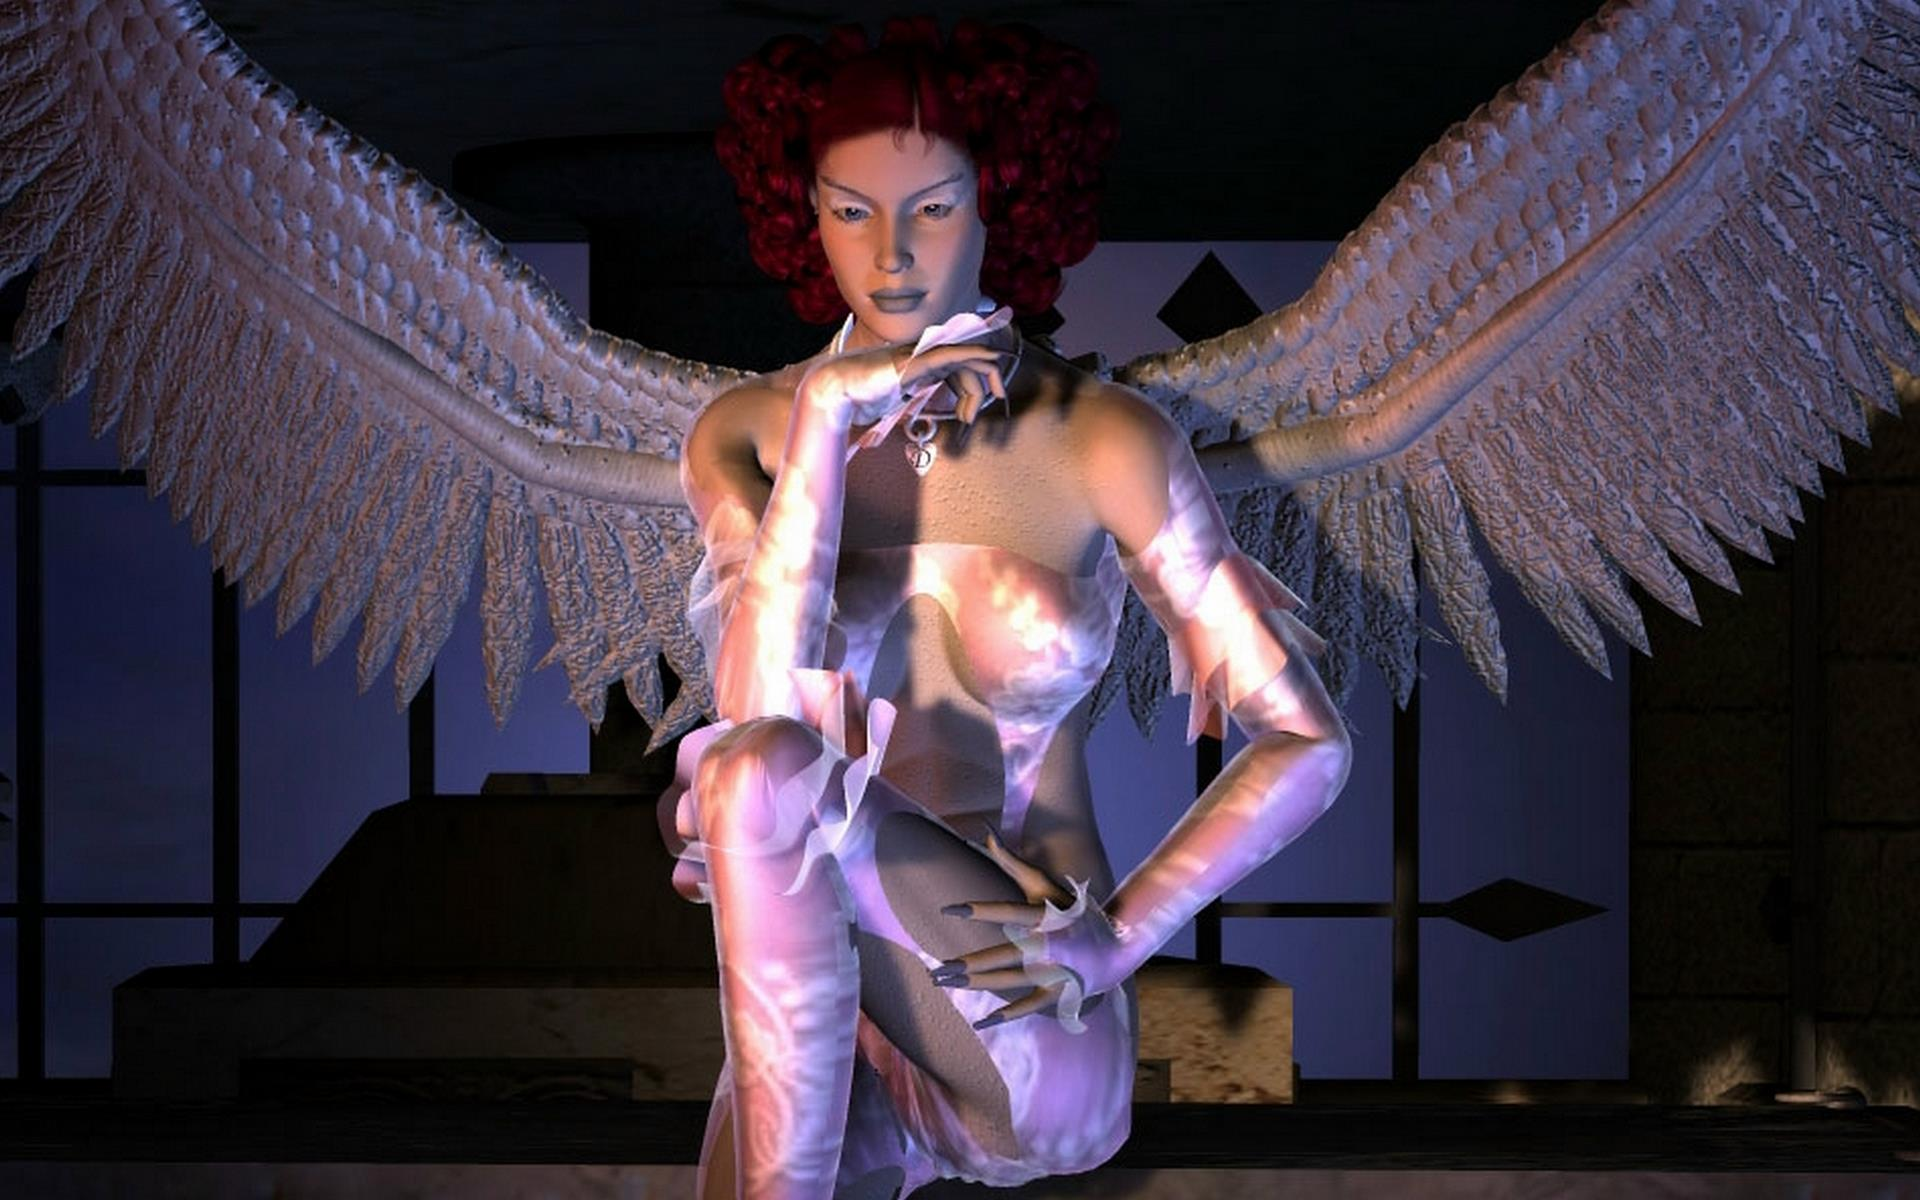 sexy_etrange_mystique_filles-HD_04